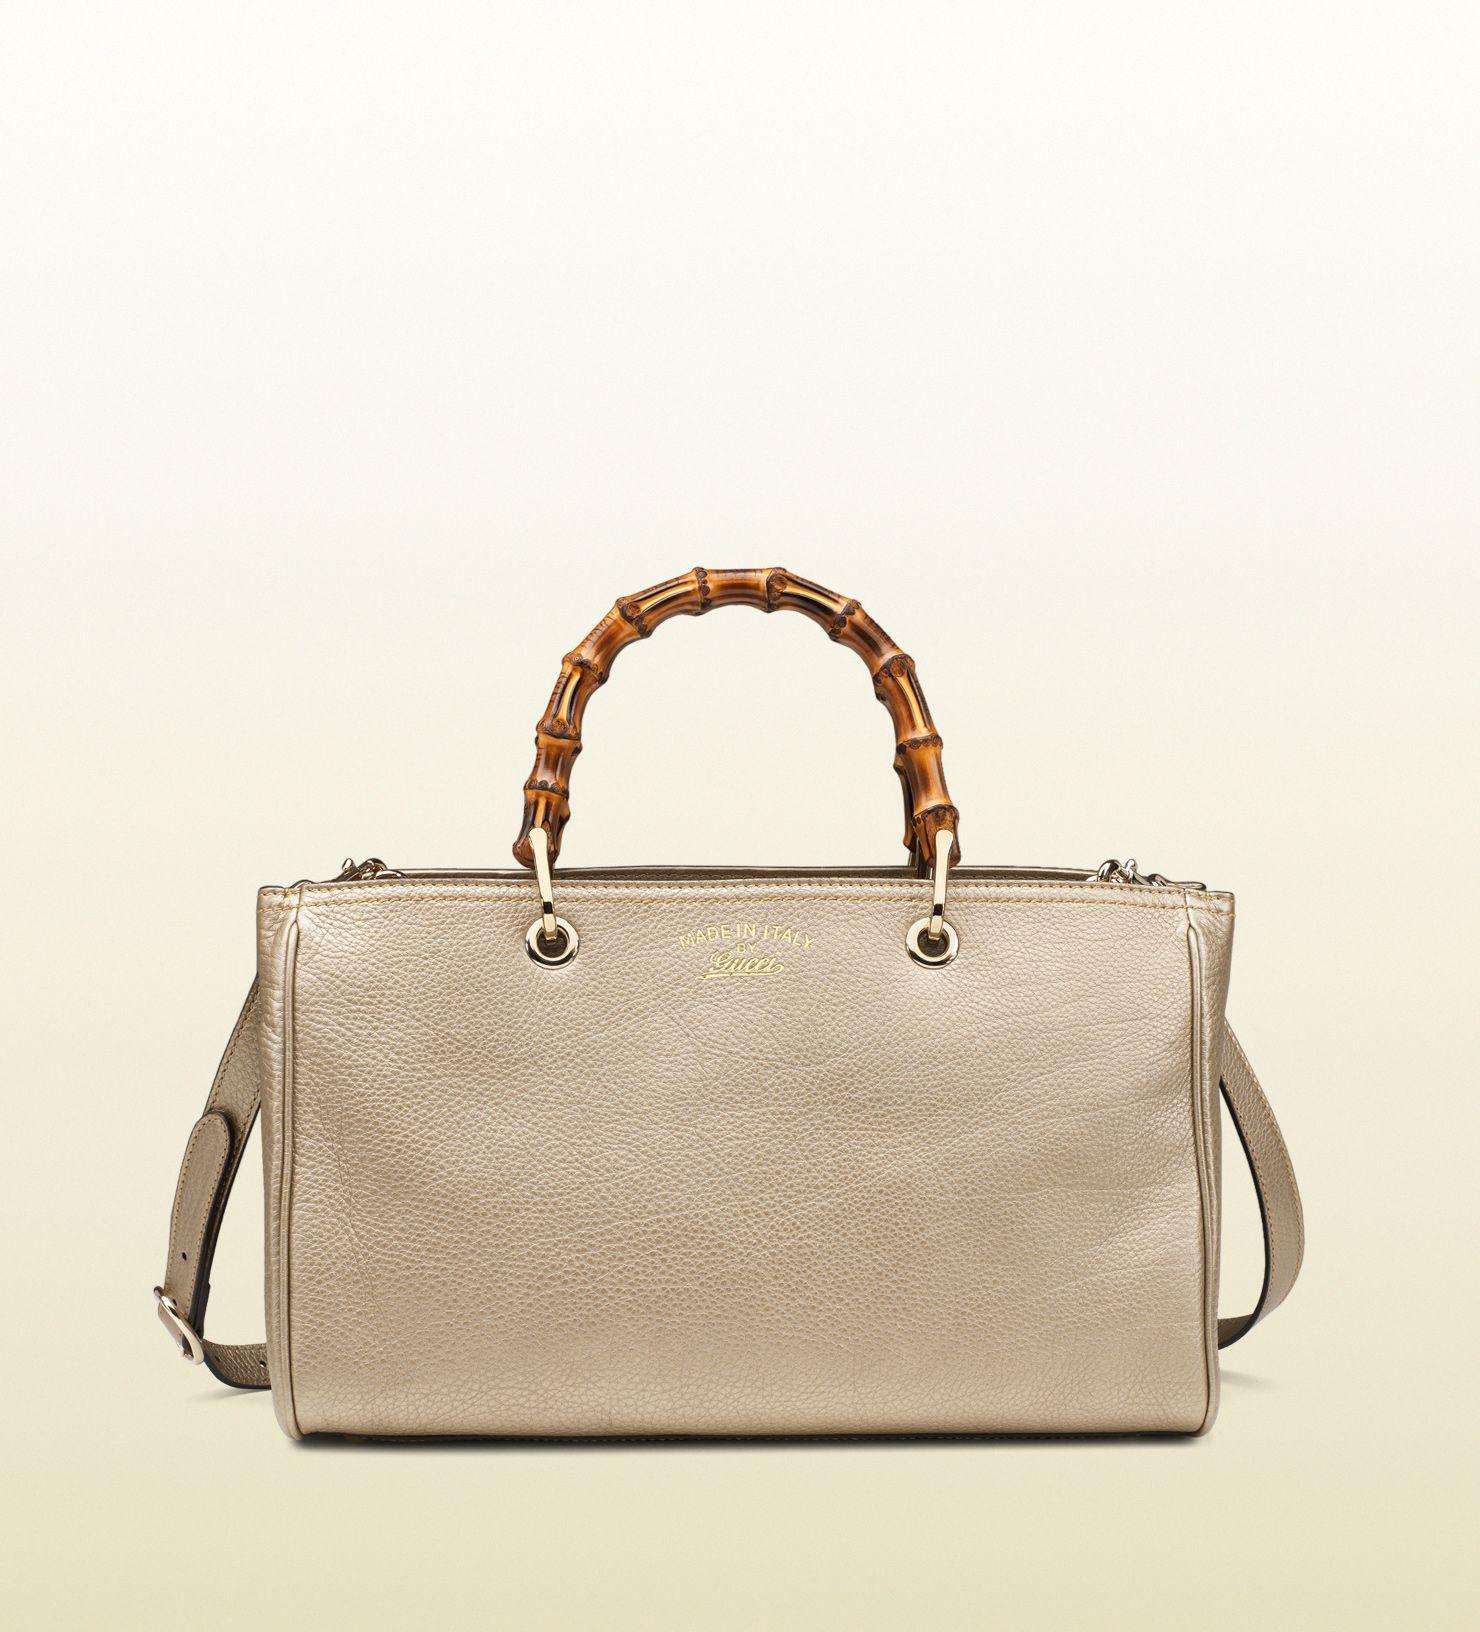 129edcdfd13 Gucci - bamboo shopper leather tote 323660AH90I9504